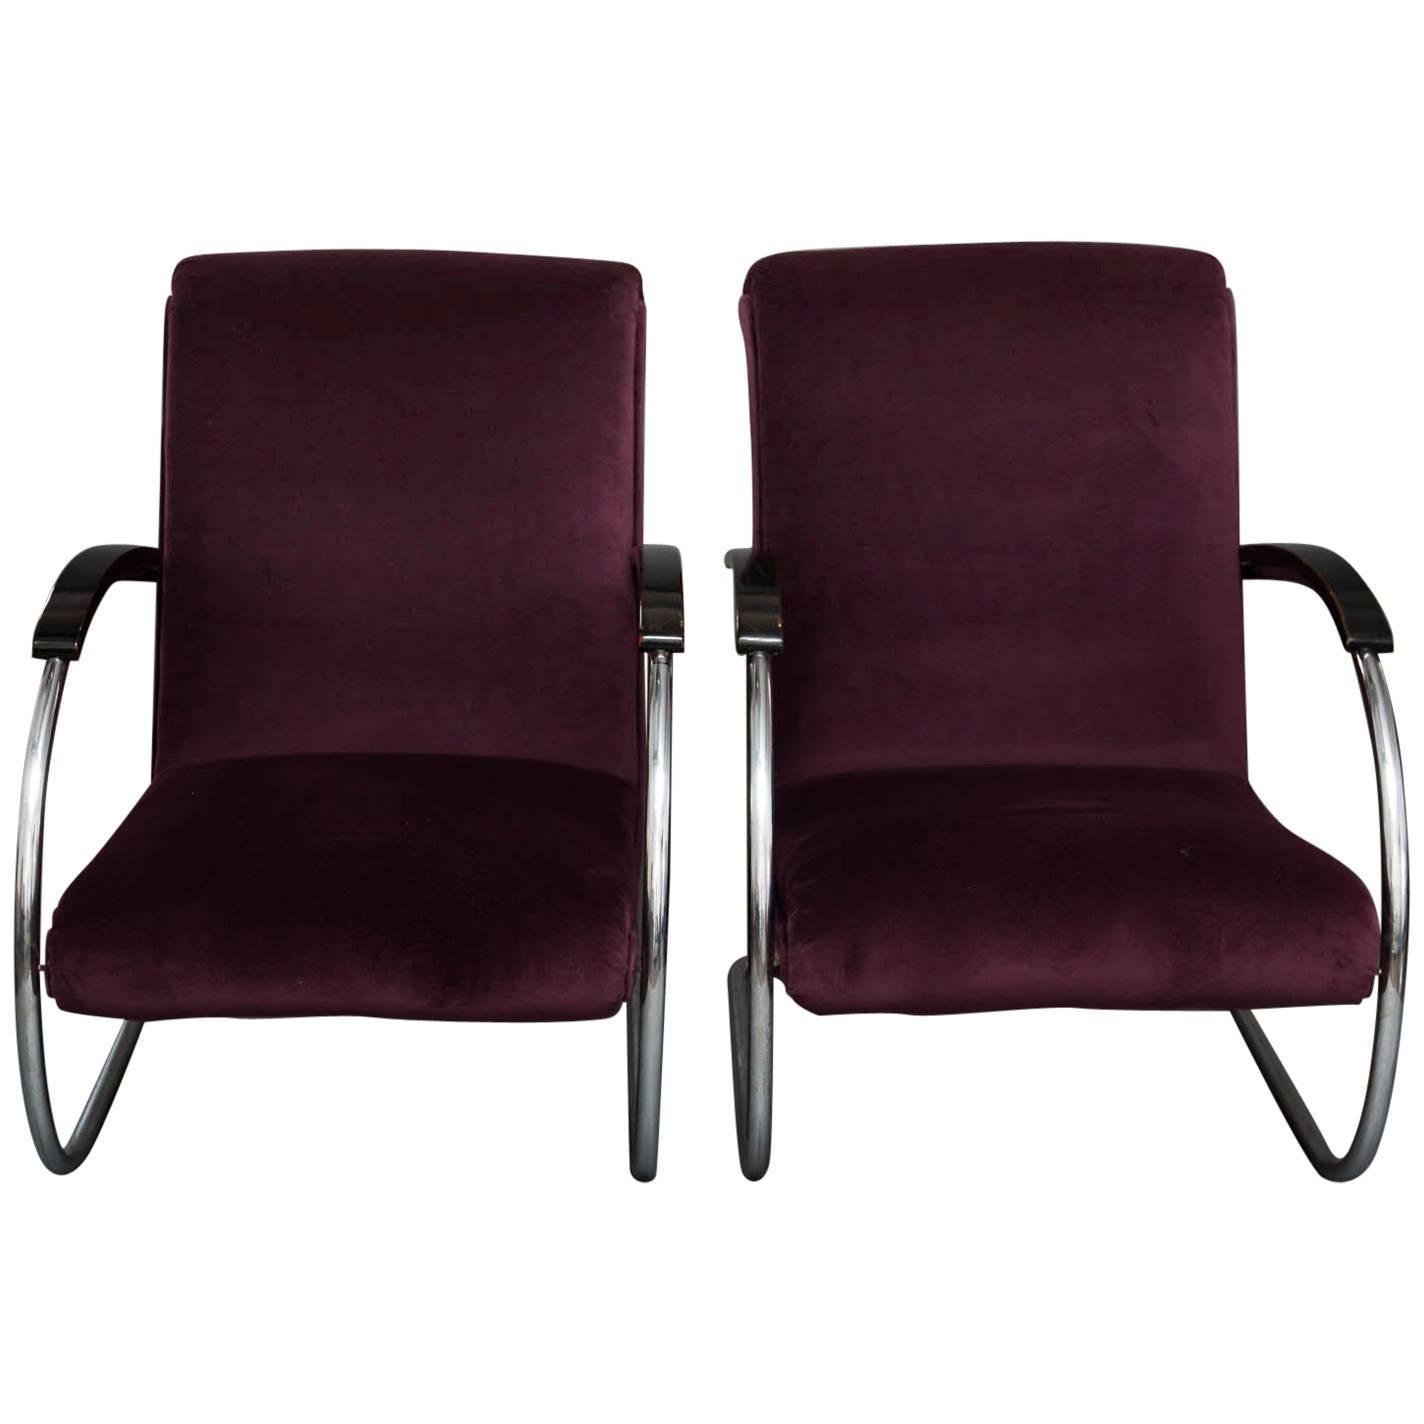 Pair Of Art Deco Lloyd Lounge Chairs In Purple Velvet